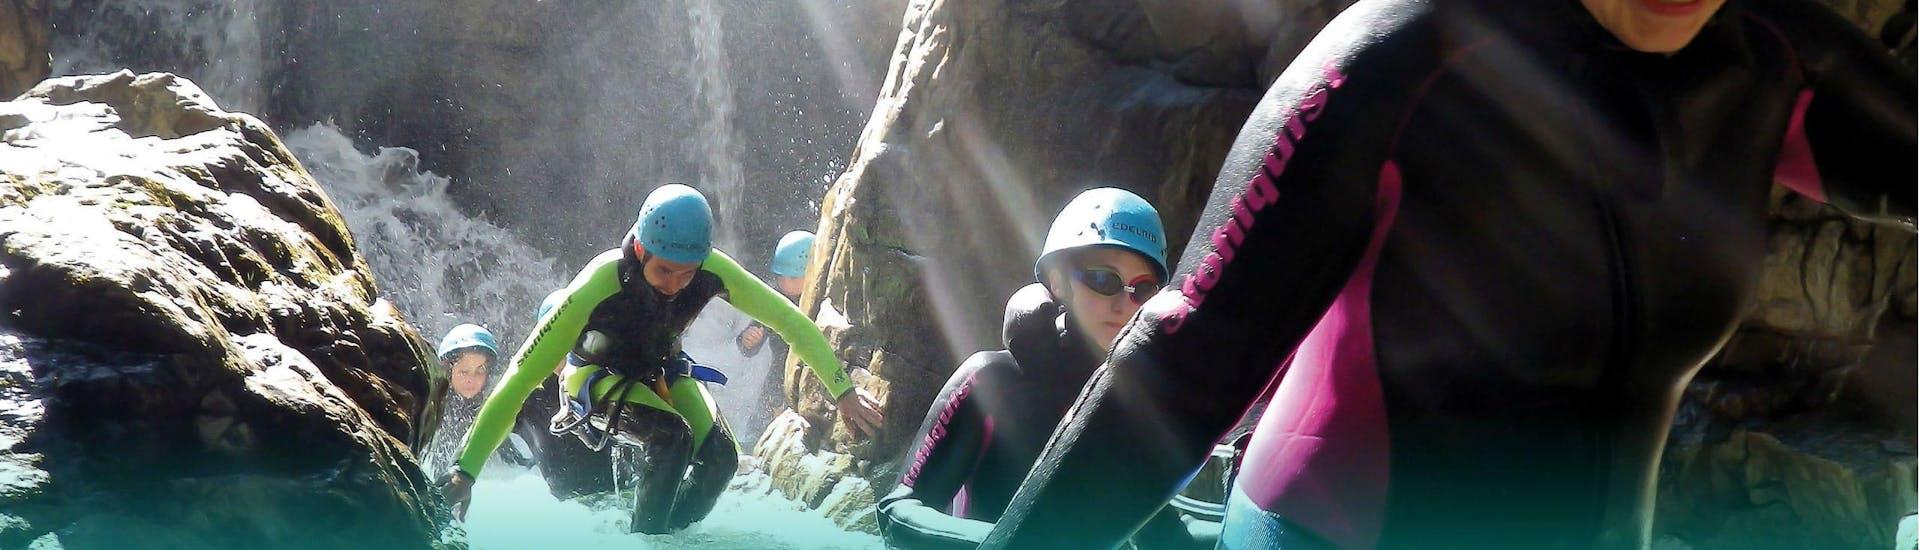 canyoning-for-beginners-first-steps-tour-adventurepark-osttirol-hero1